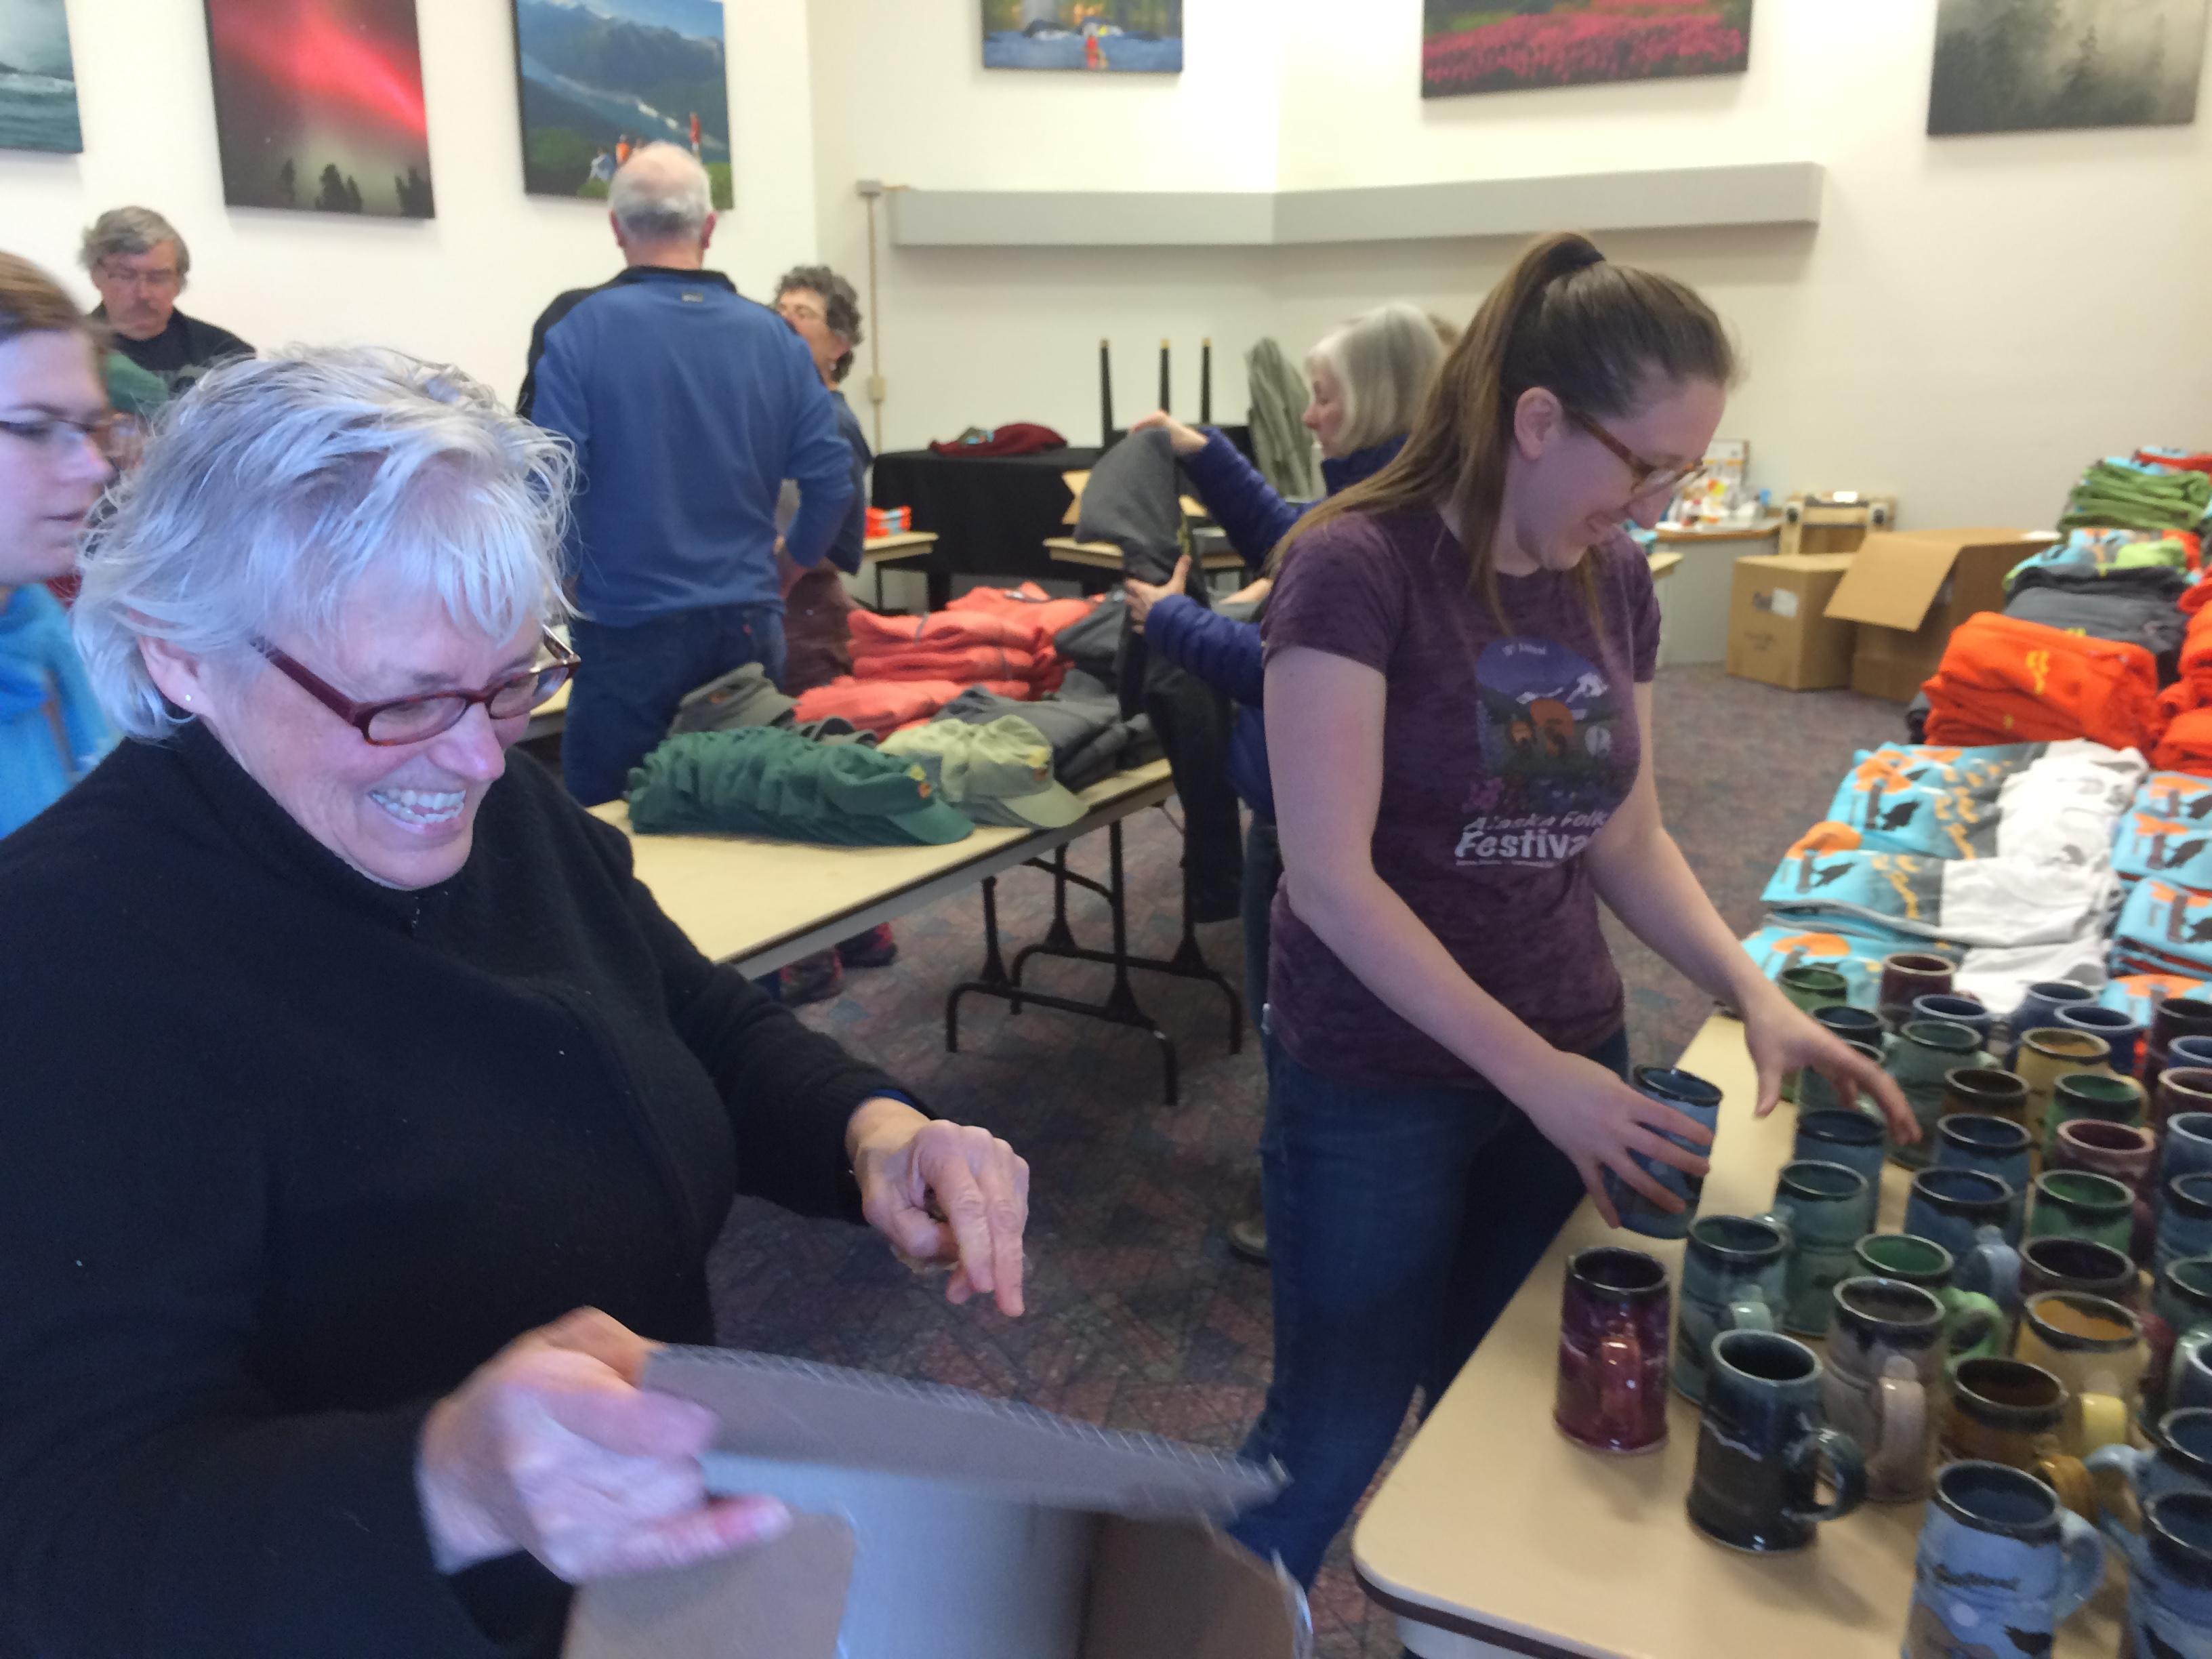 Carol Ackerman and Erin Hanson set up the merchandise table on Sunday. (Photo Scott Burton/KTOO)